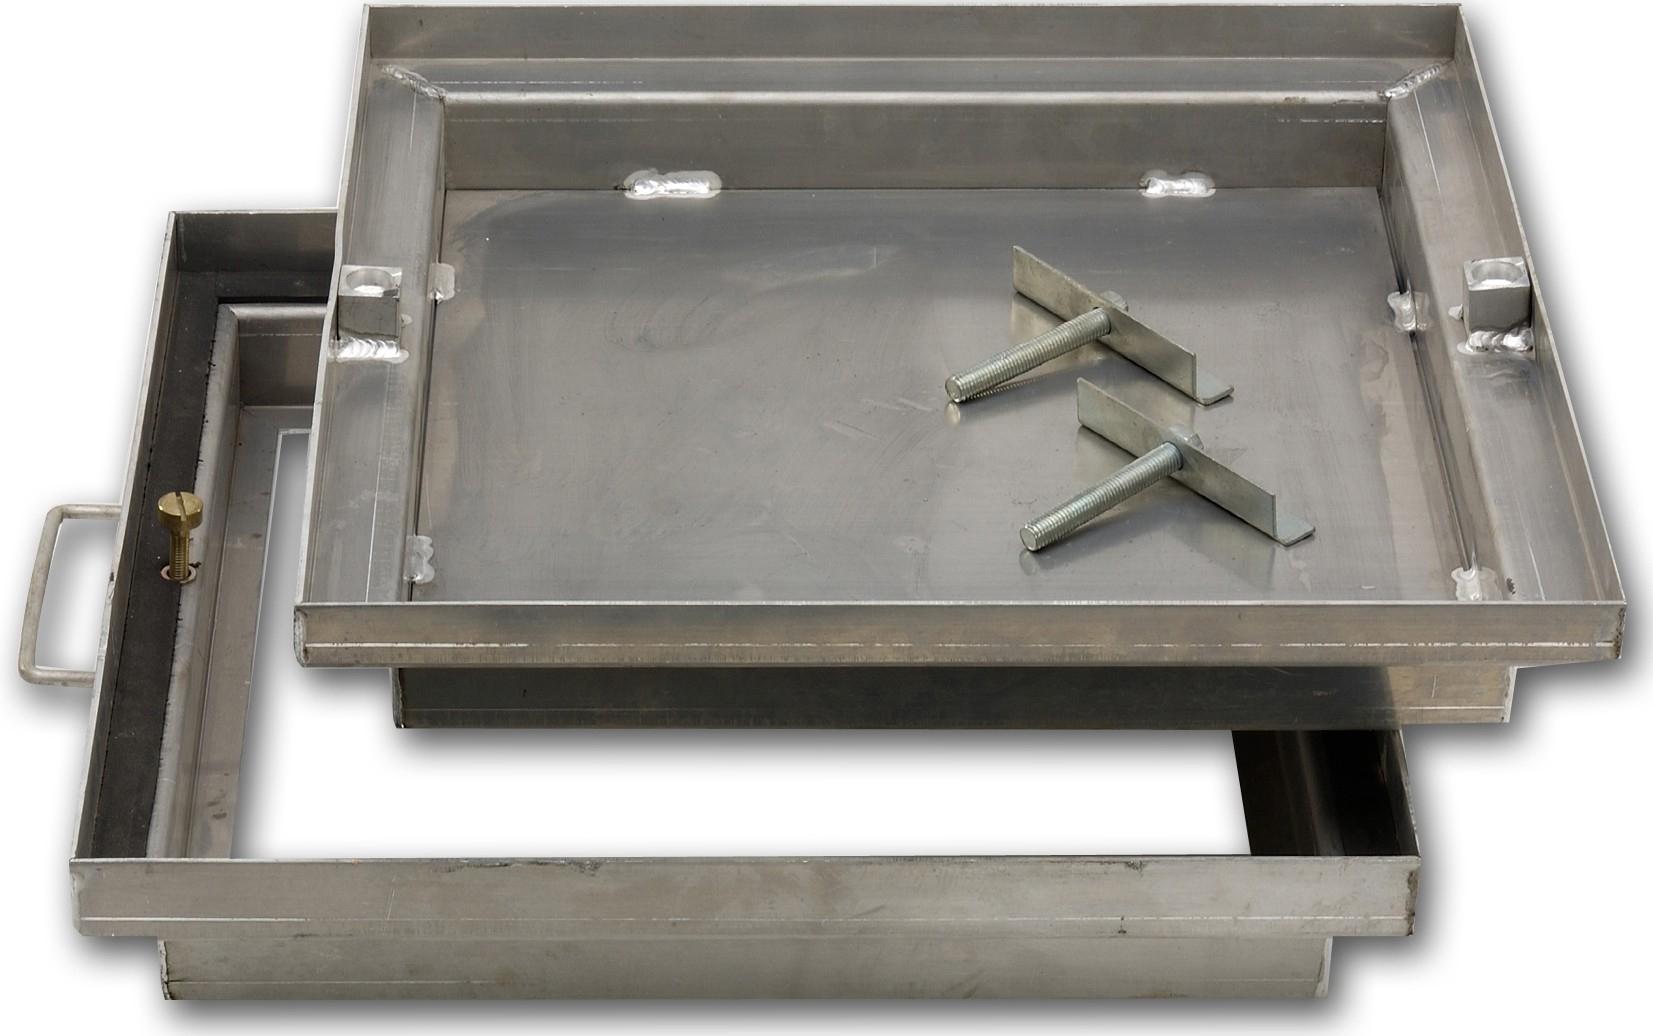 Couvercle À Carreler En Aluminium concernant Couvercle De Regard À Carreler Castorama